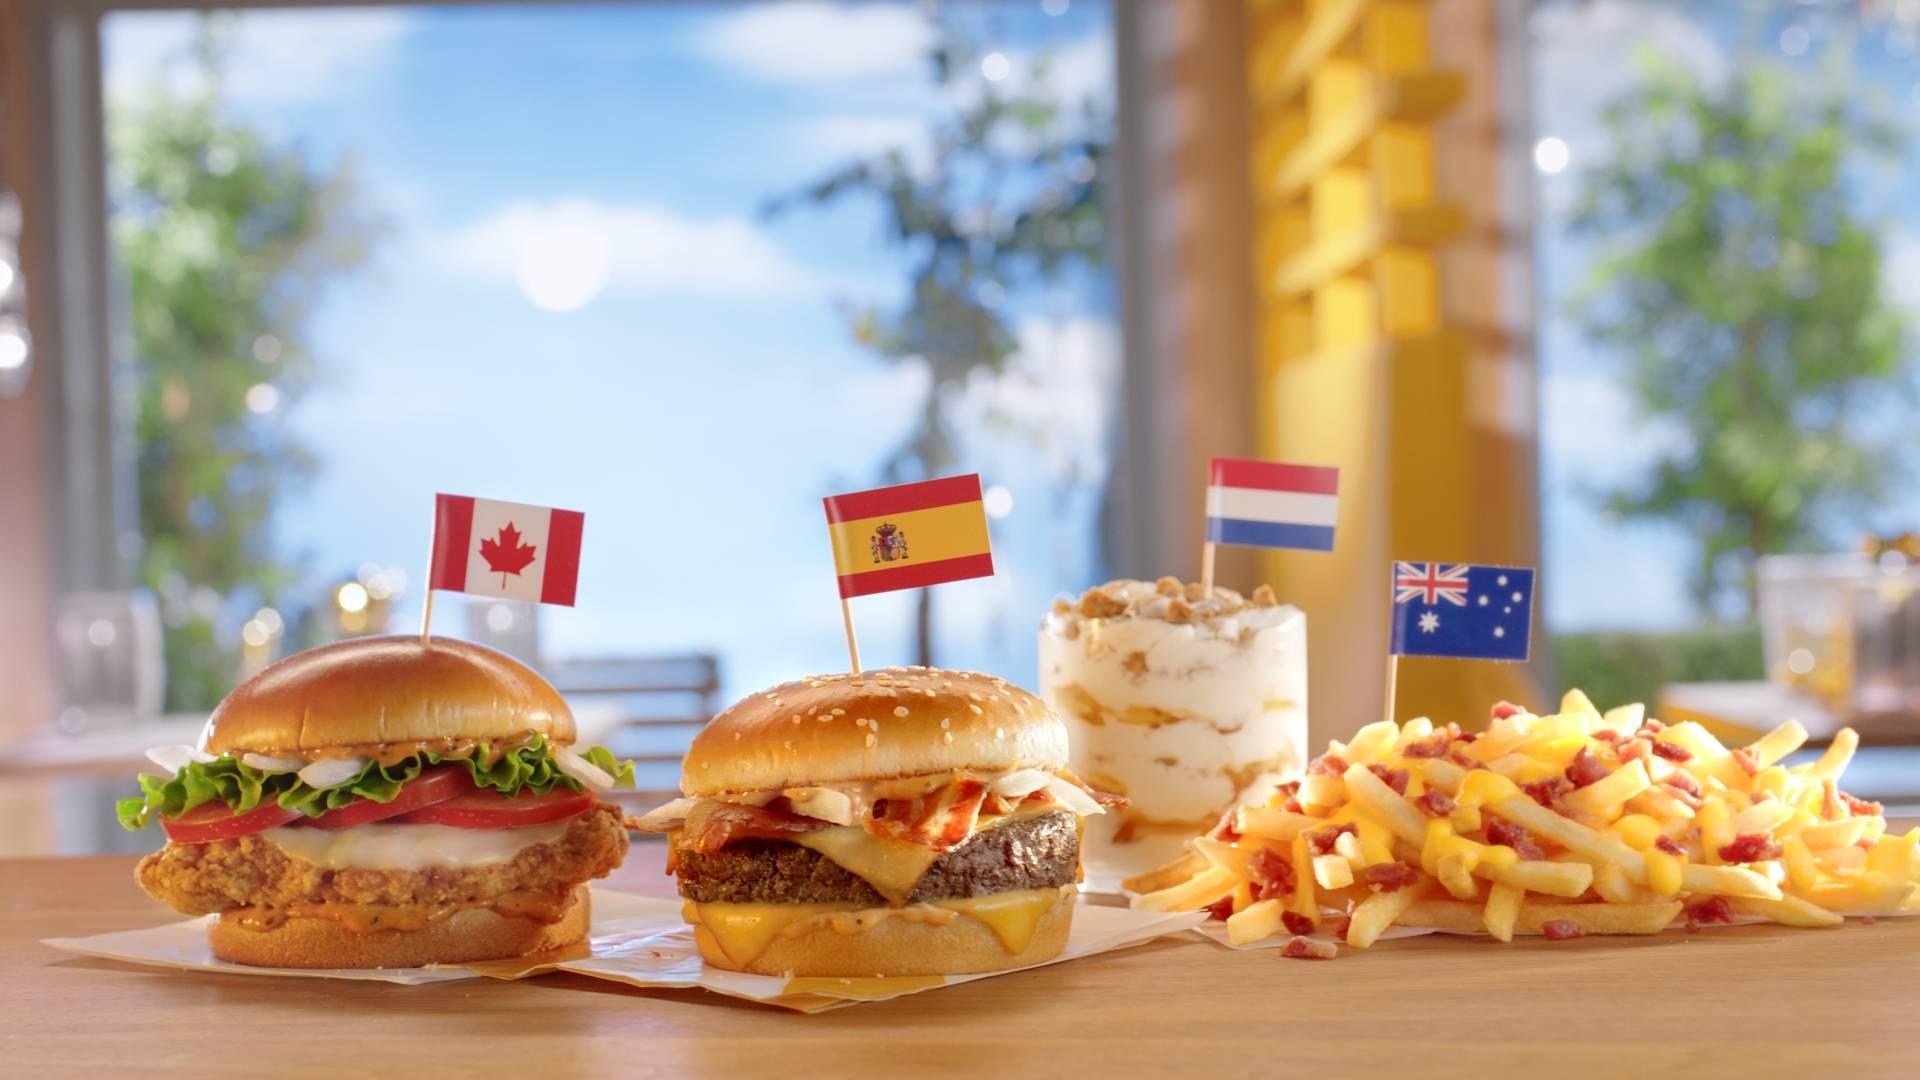 McDonald's global menu items